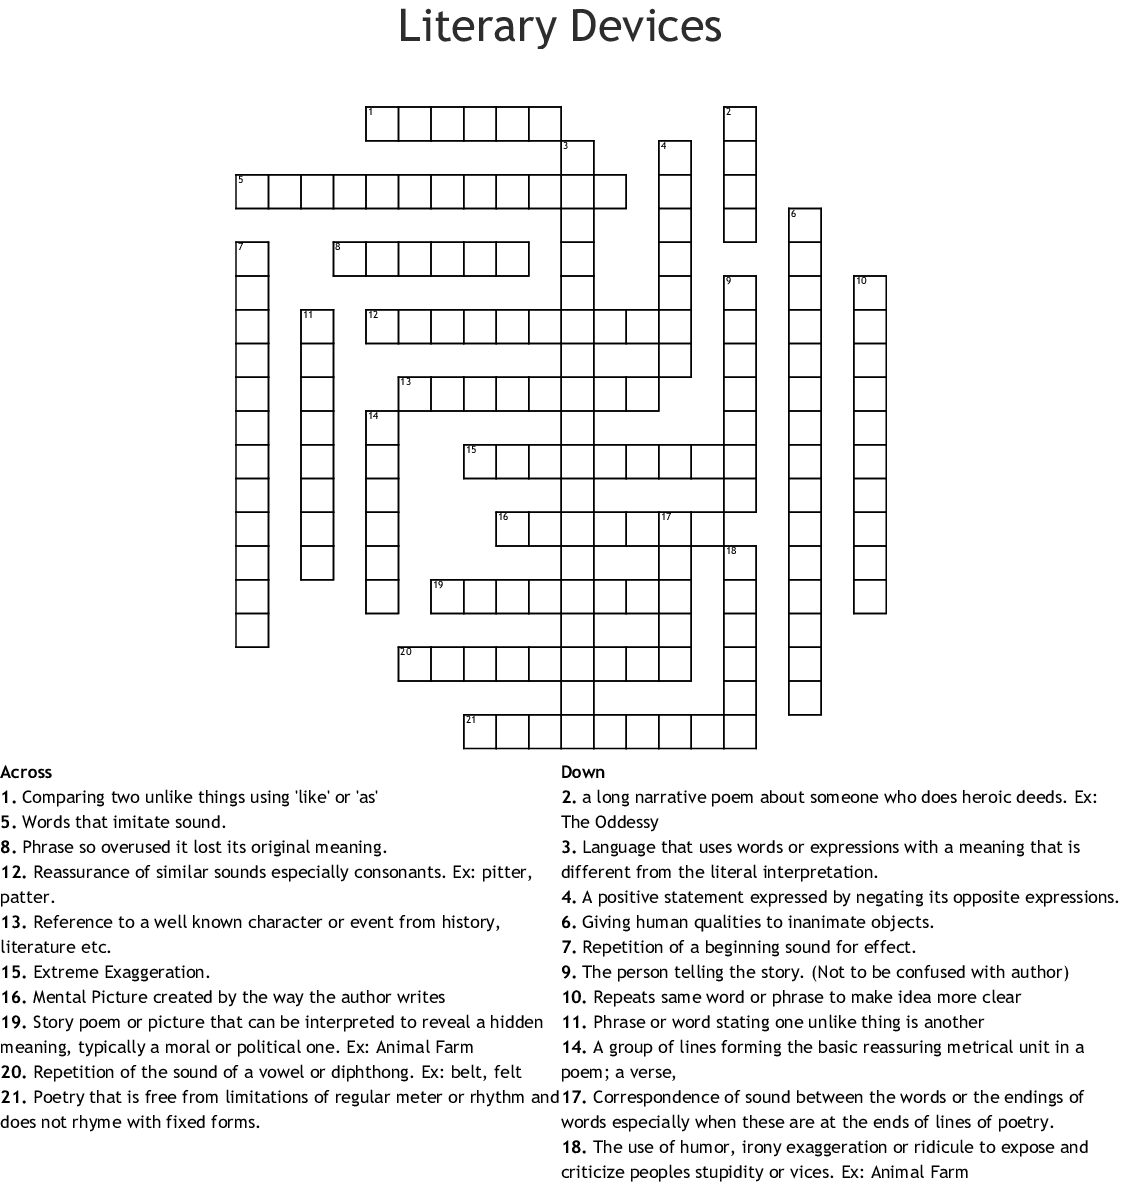 Literary Devices Crossword